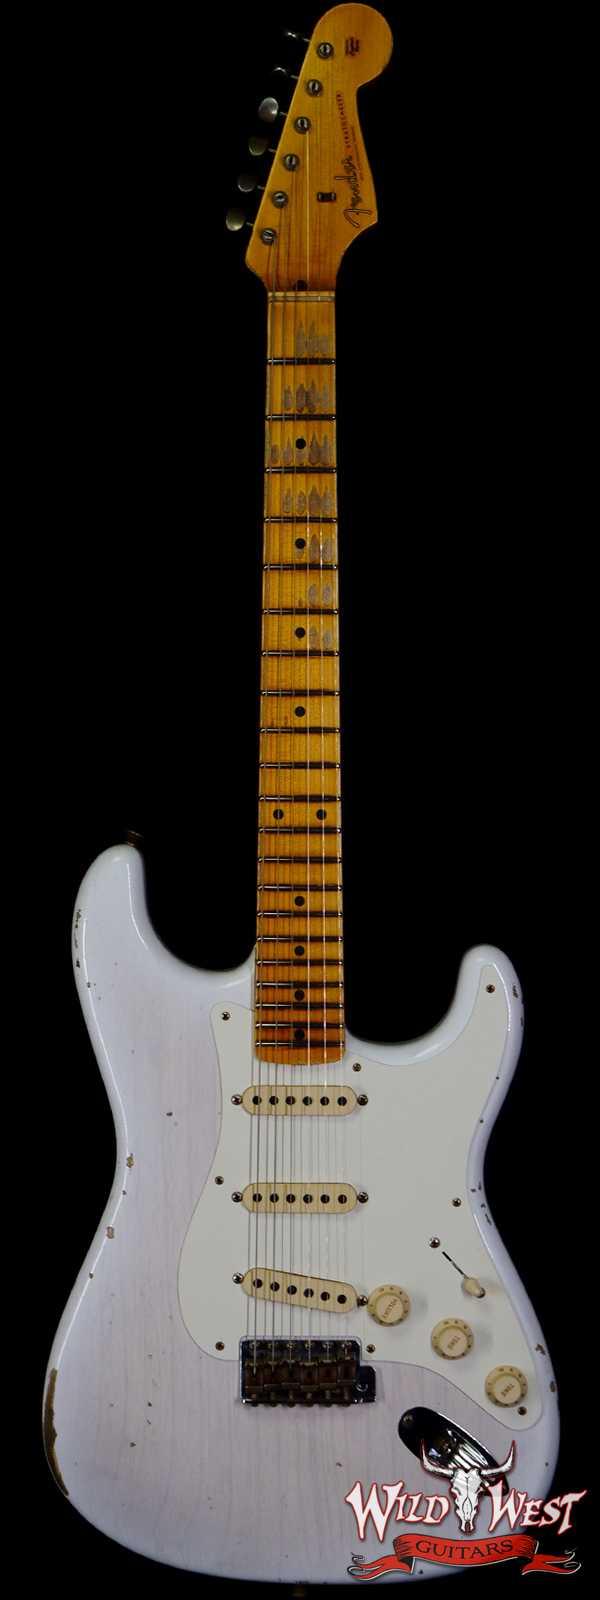 Fender Custom Shop 1957 Stratocaster Relic Ash Body Quartersawn Maple Neck Mary Kaye Blonde